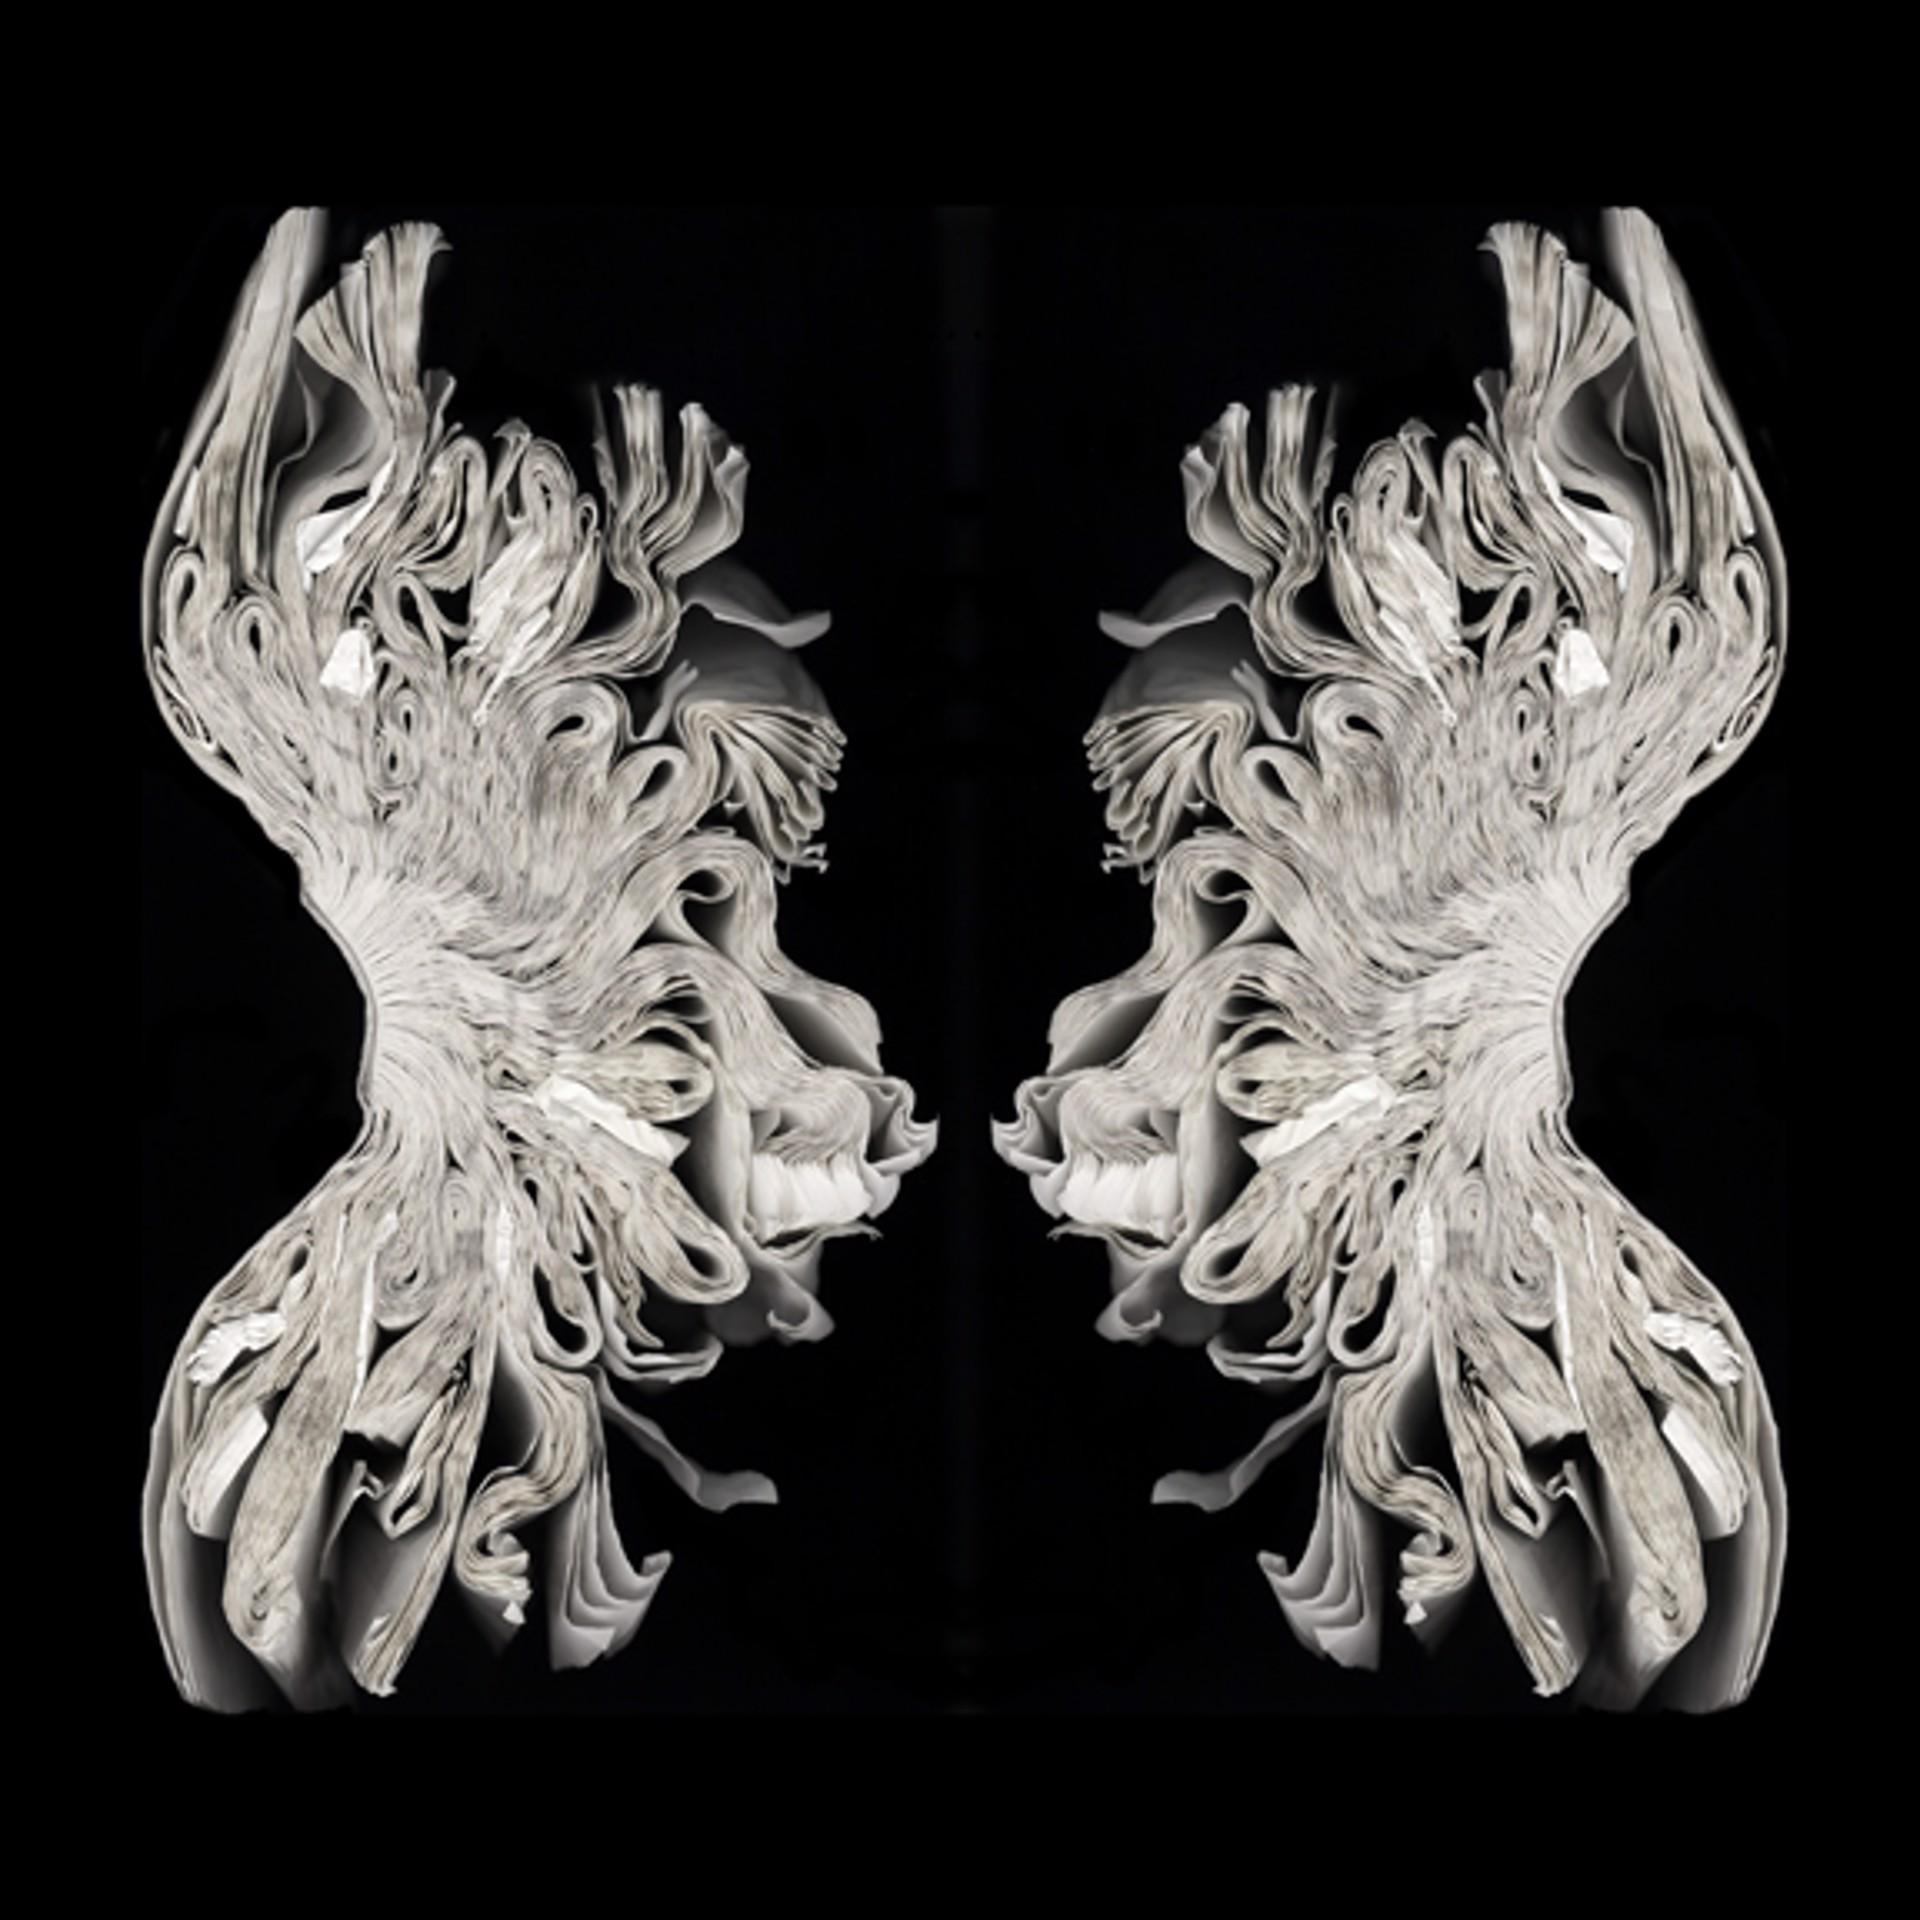 Rorschach Corset by Cara Barer